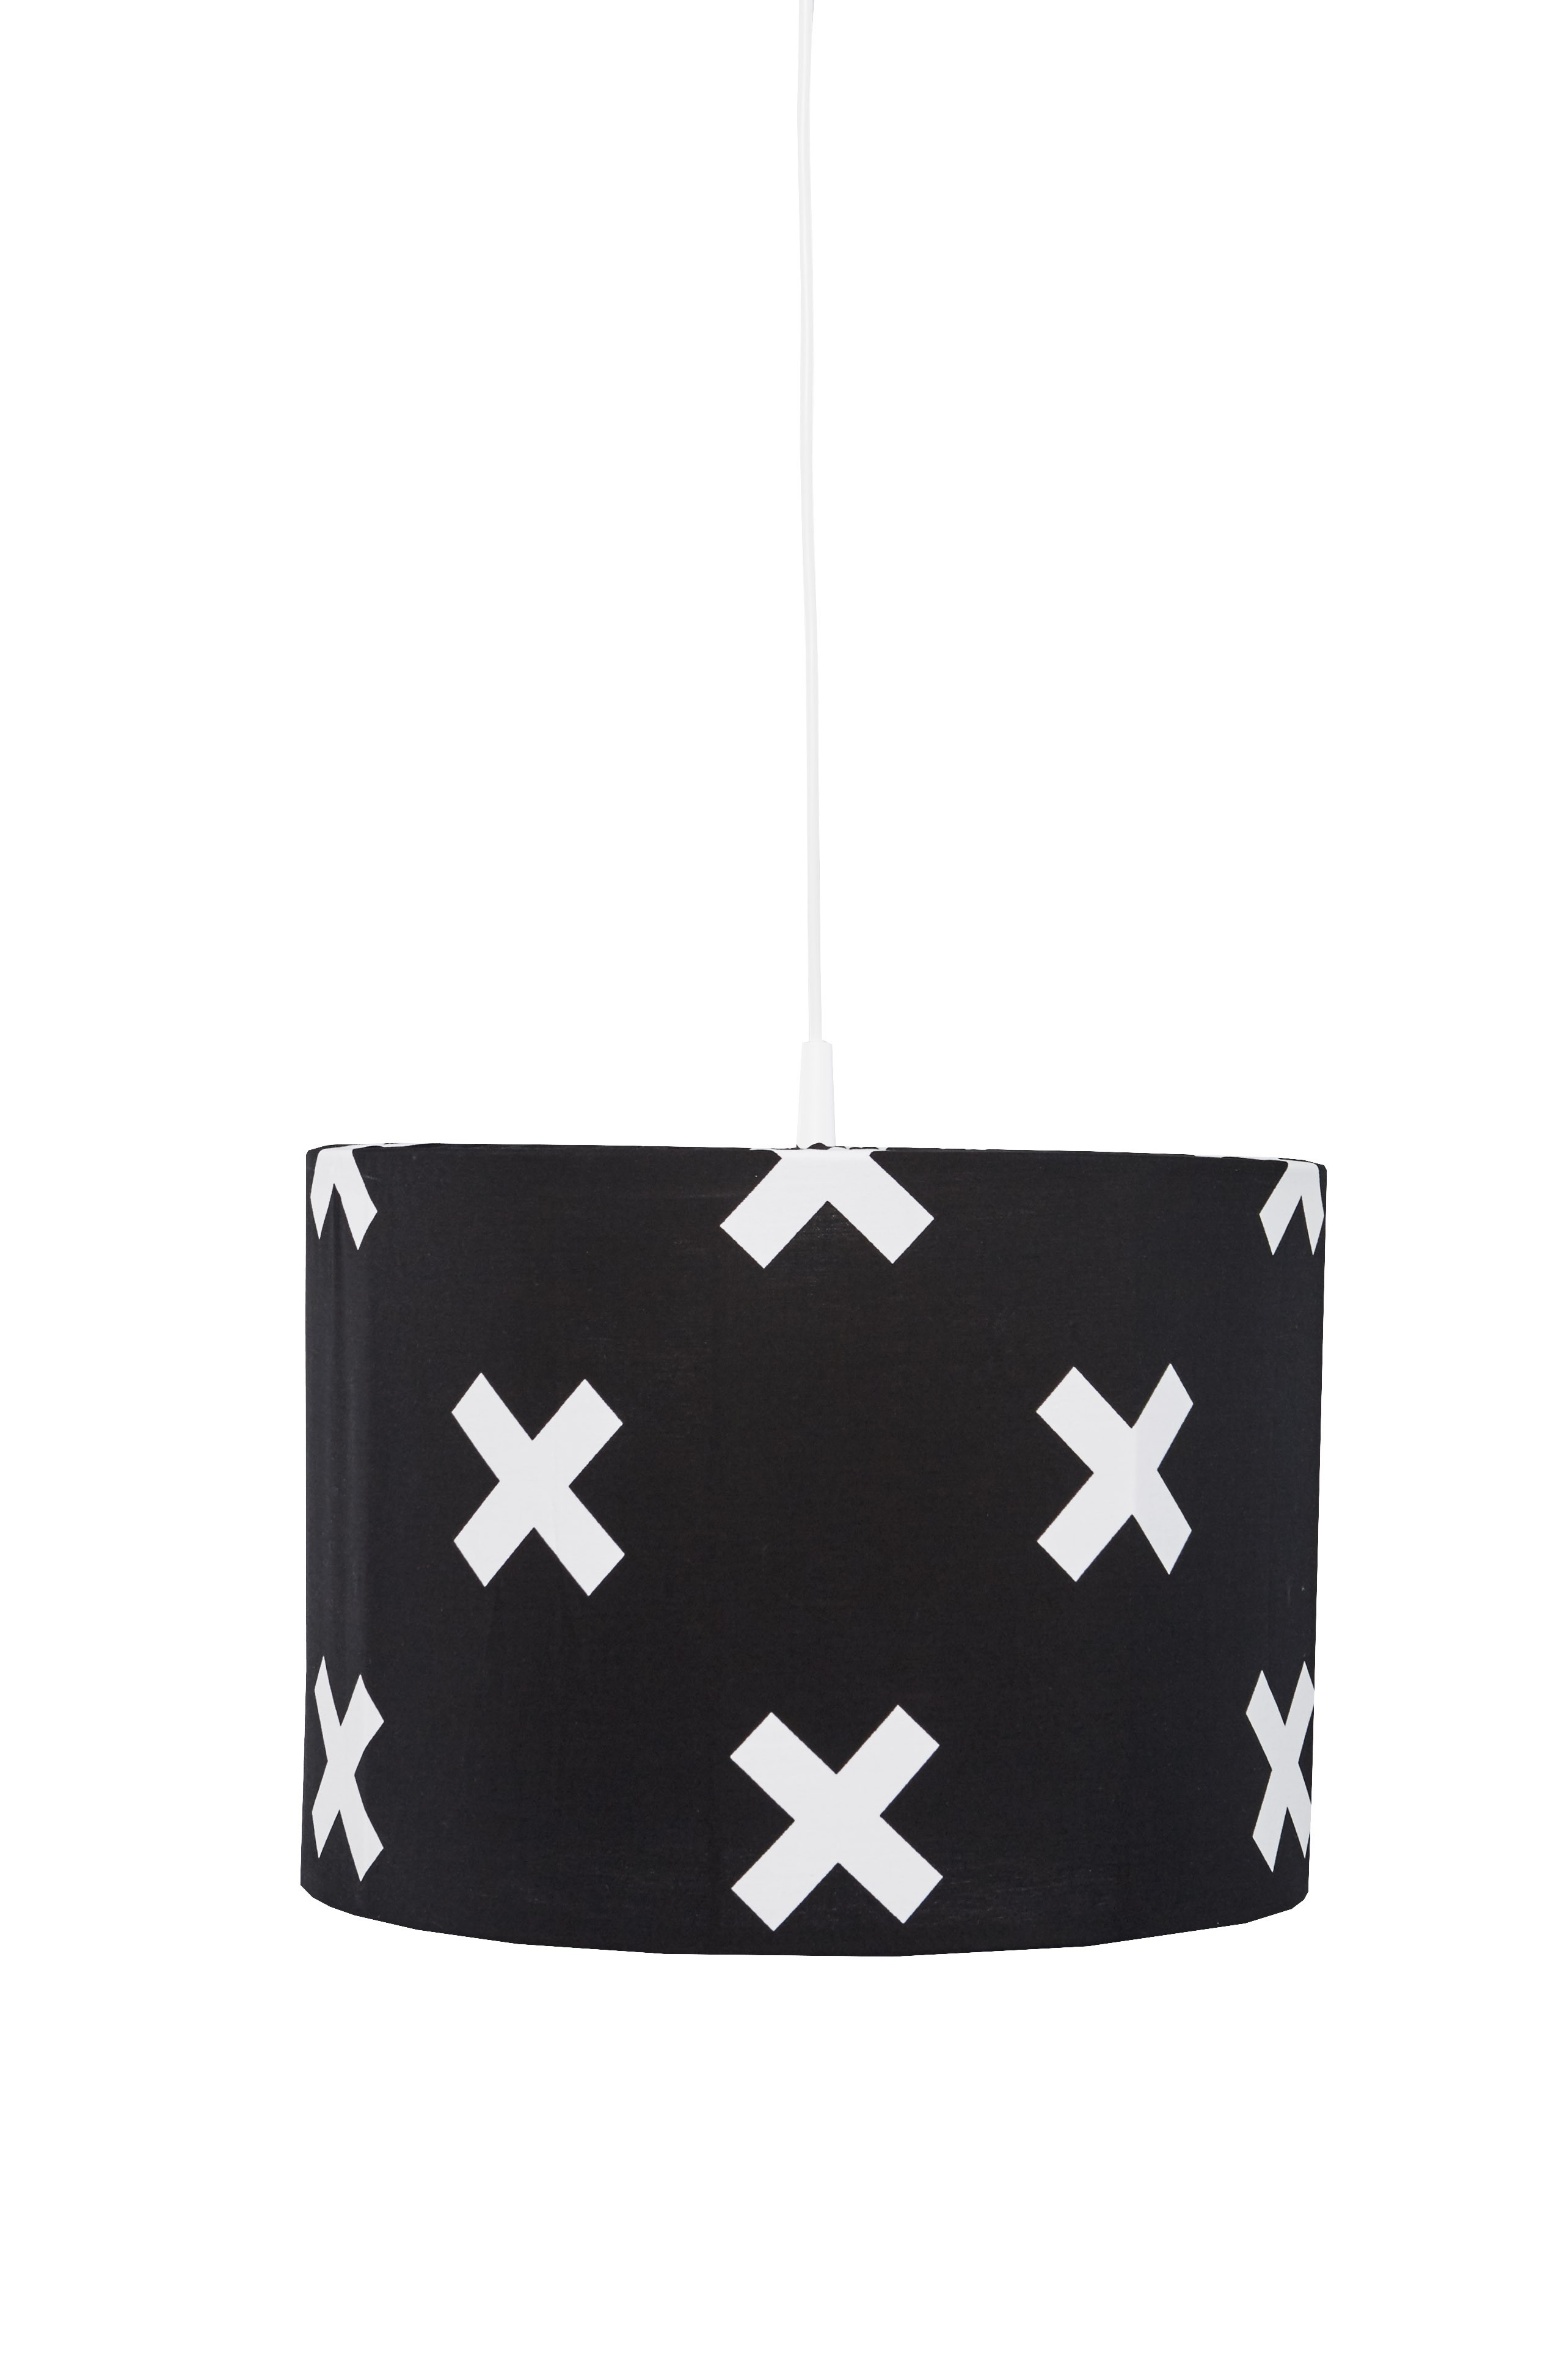 Hanglamp Cross - zwart/wit